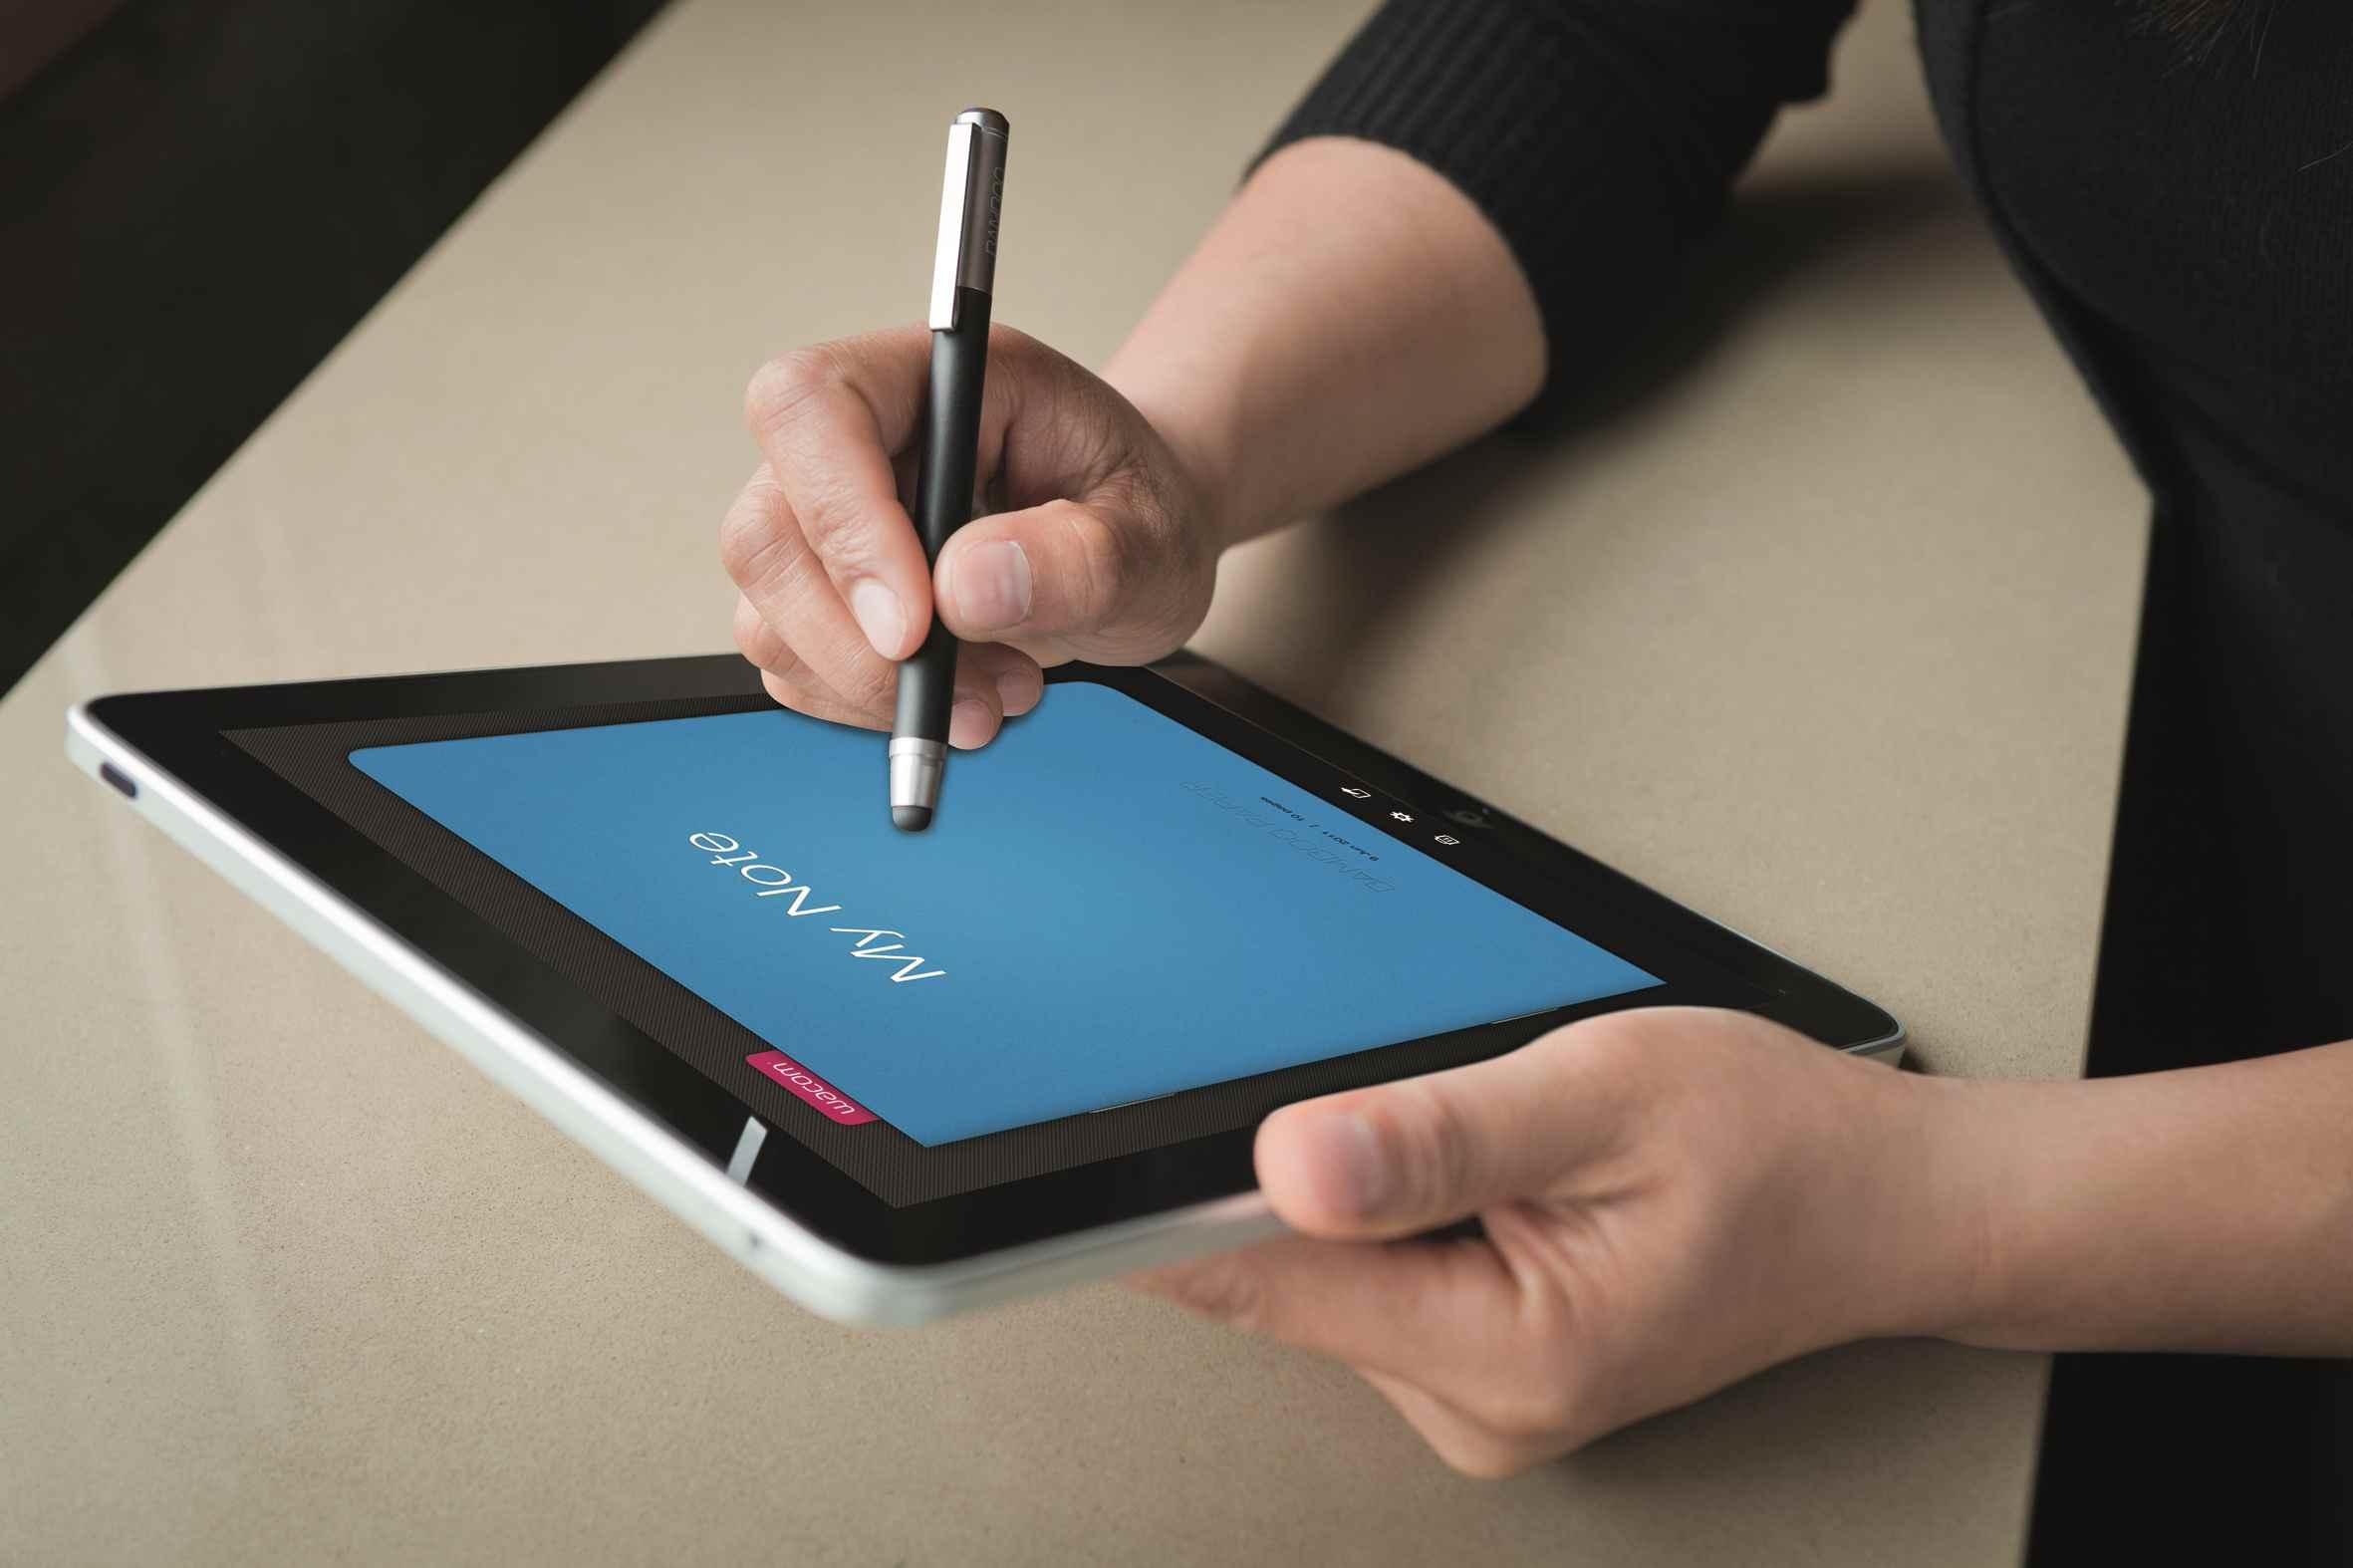 iPad 2 as a serious writing machine (how-to)